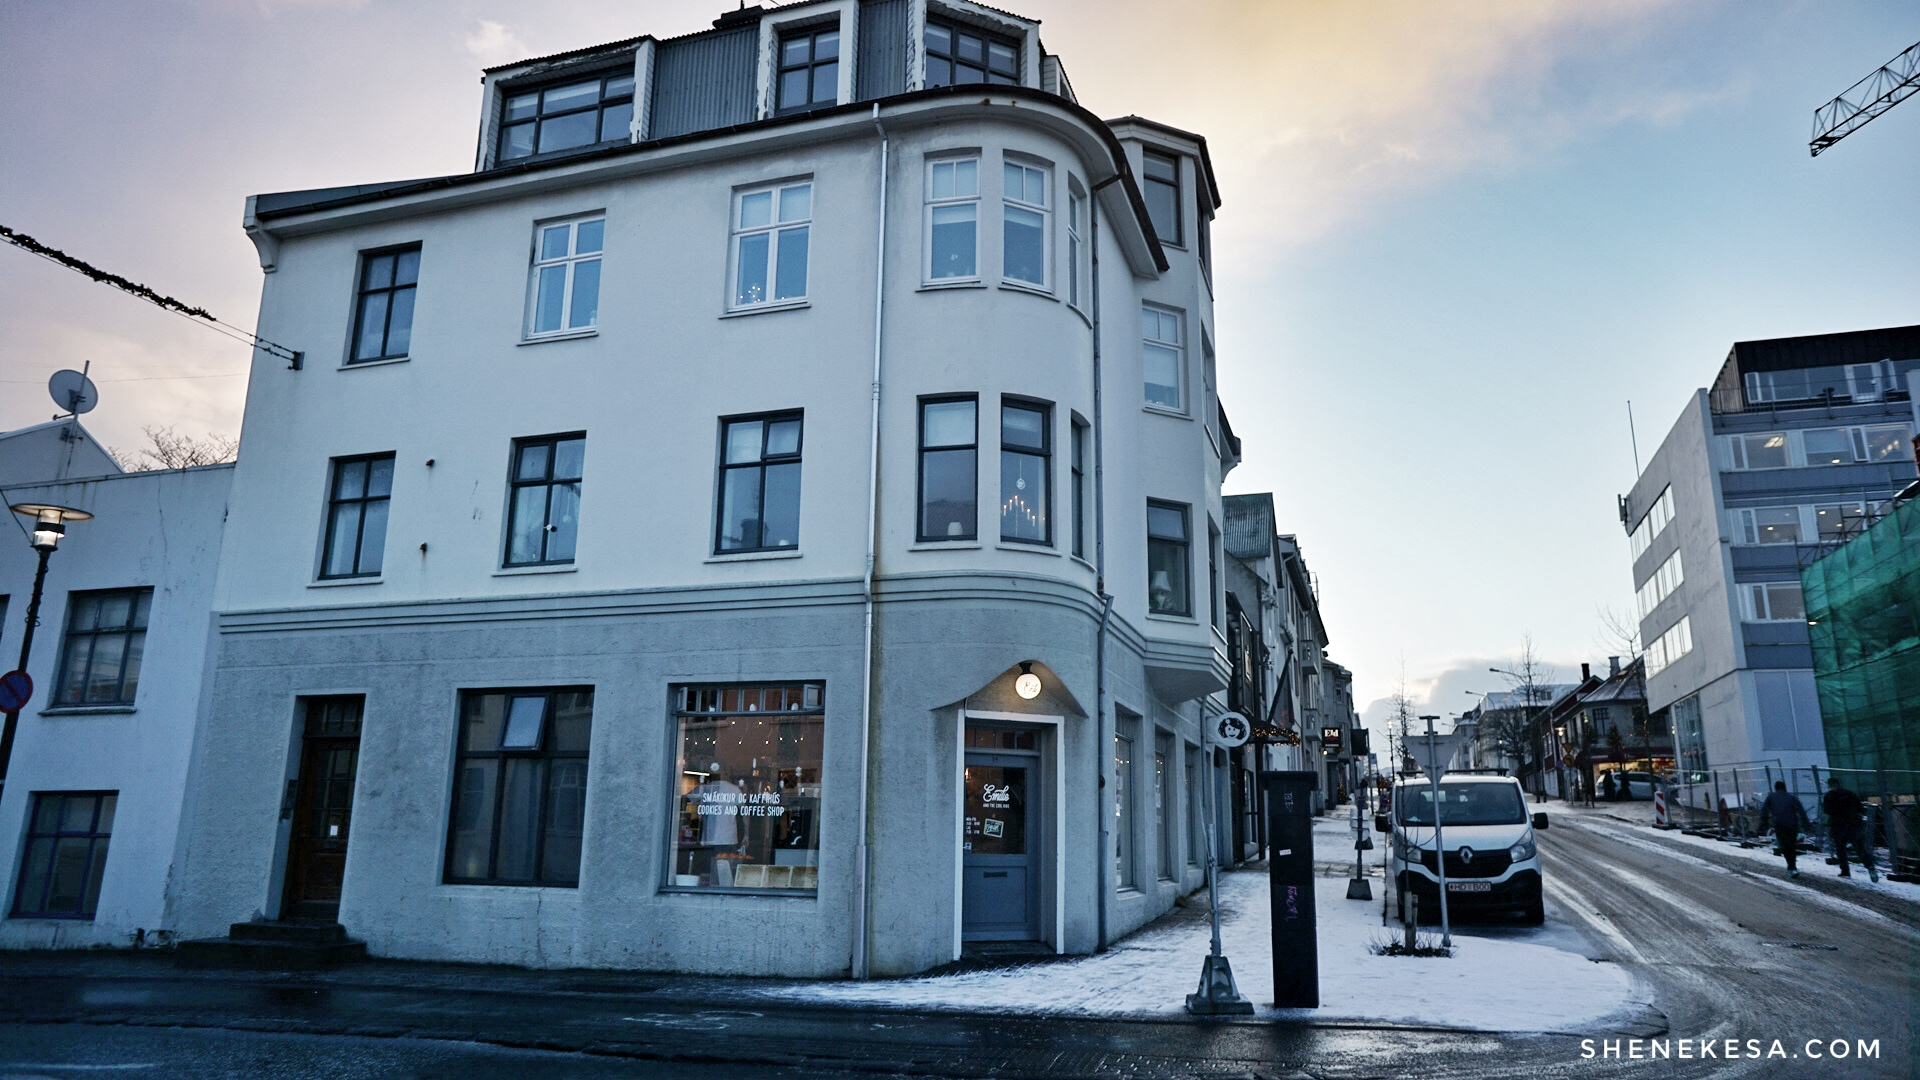 Emilie coffee Reykjavik by She Nekesa